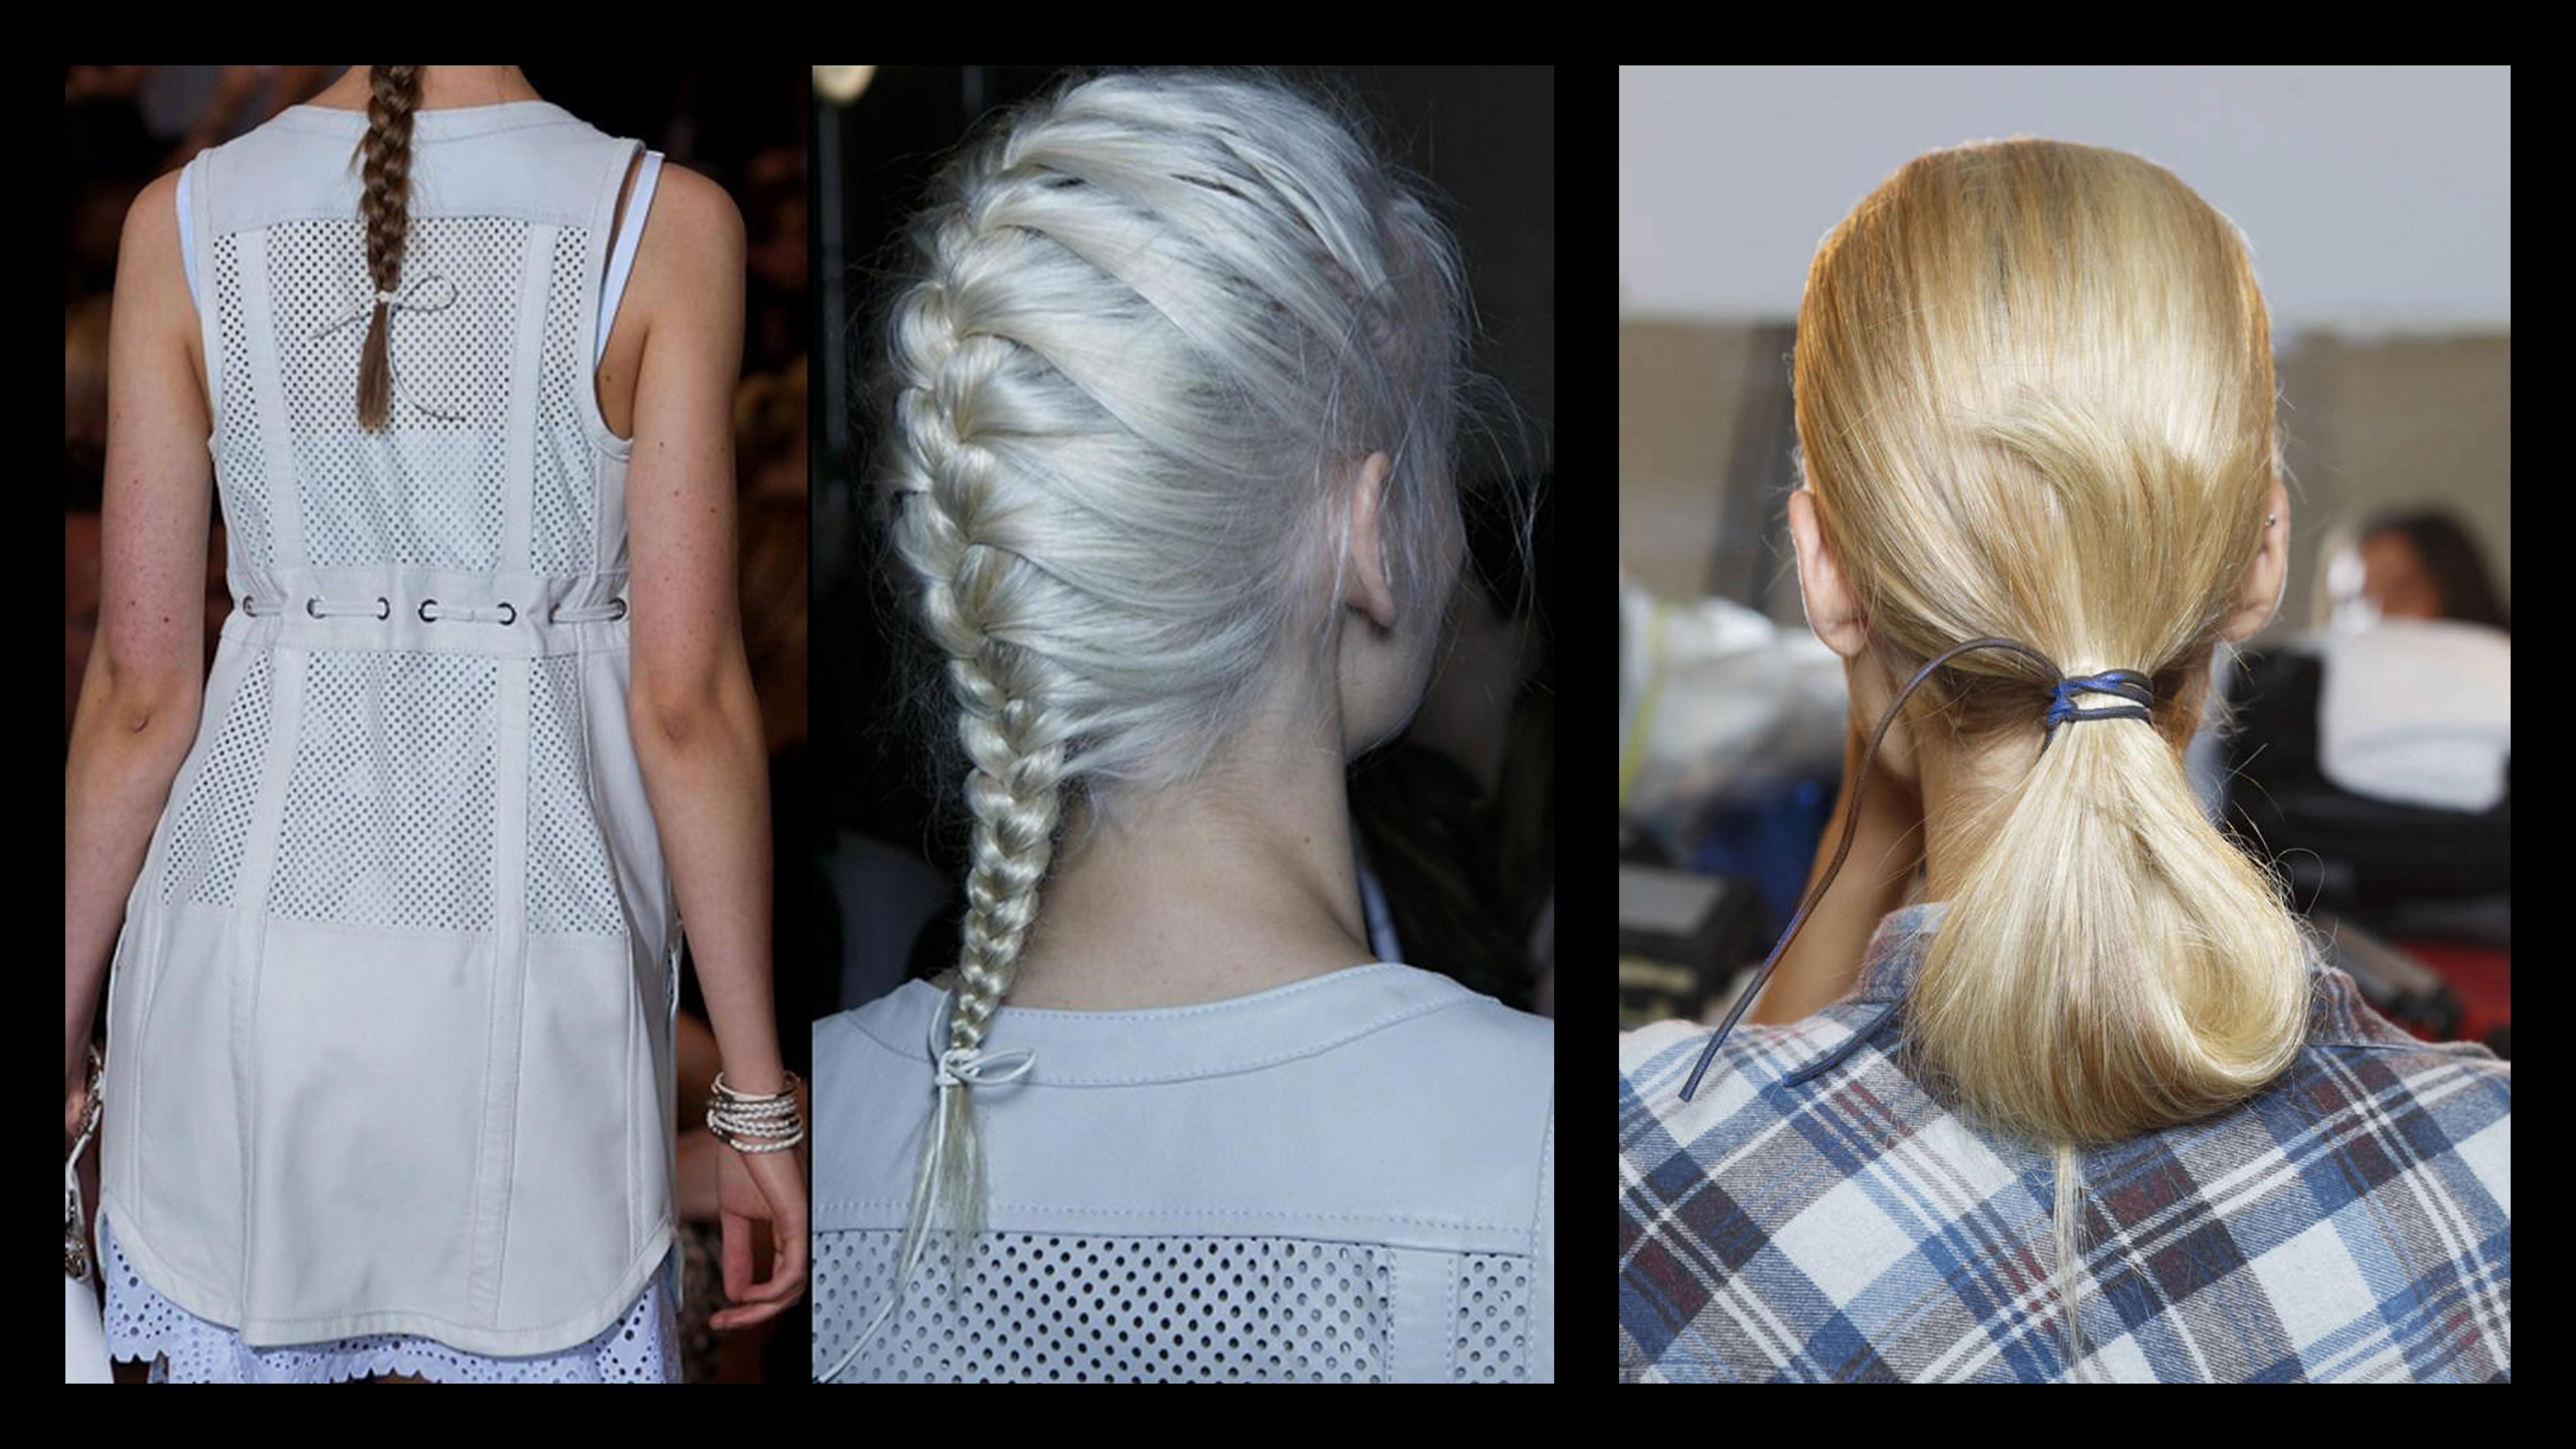 cd6fdae6bd Hairstyle Trend  5 τρόποι να χρησιμοποιήσεις δερμάτινα αξεσουάρ στα μαλλιά  σου!